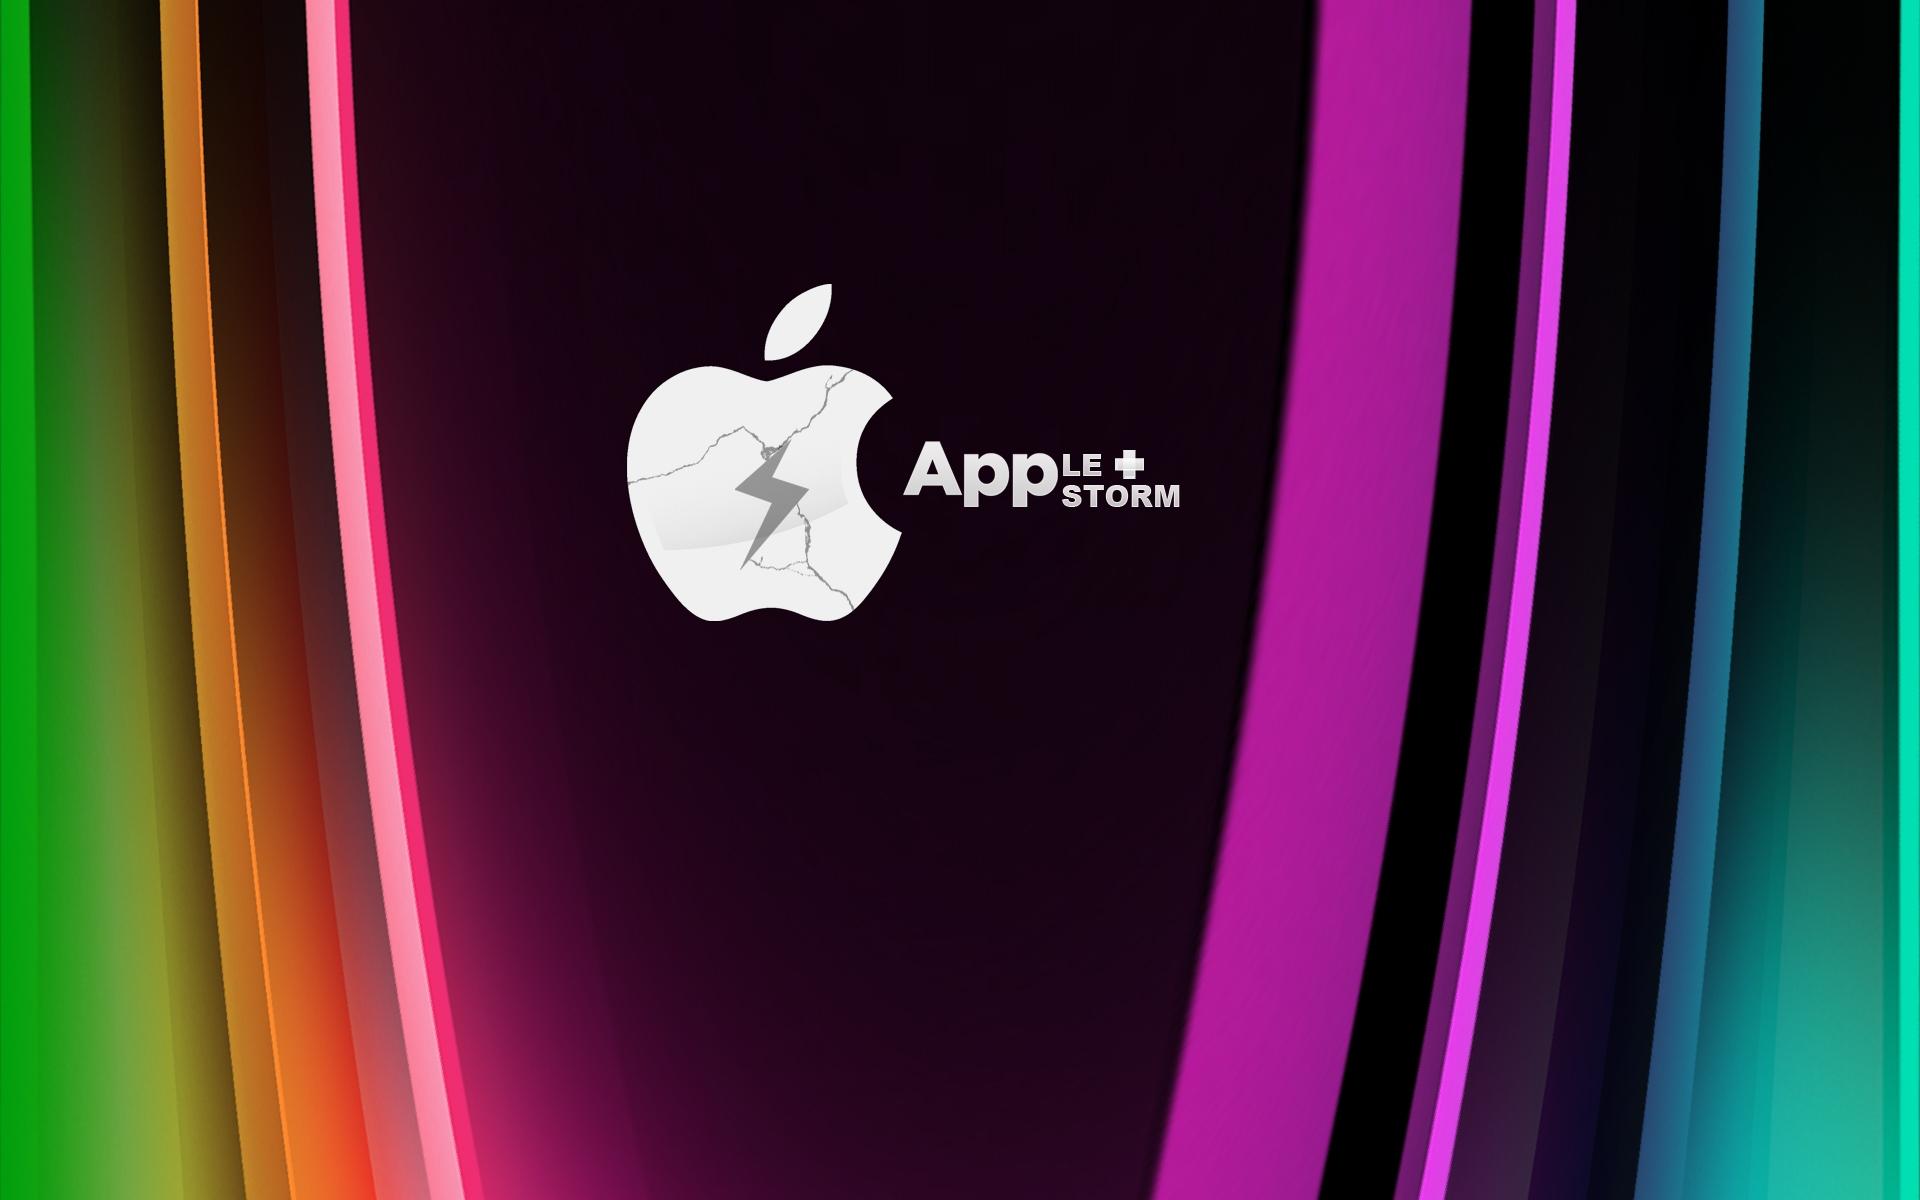 Sfondi Colorato Tecnologia Le Tende Rosa Magenta Mela Mac